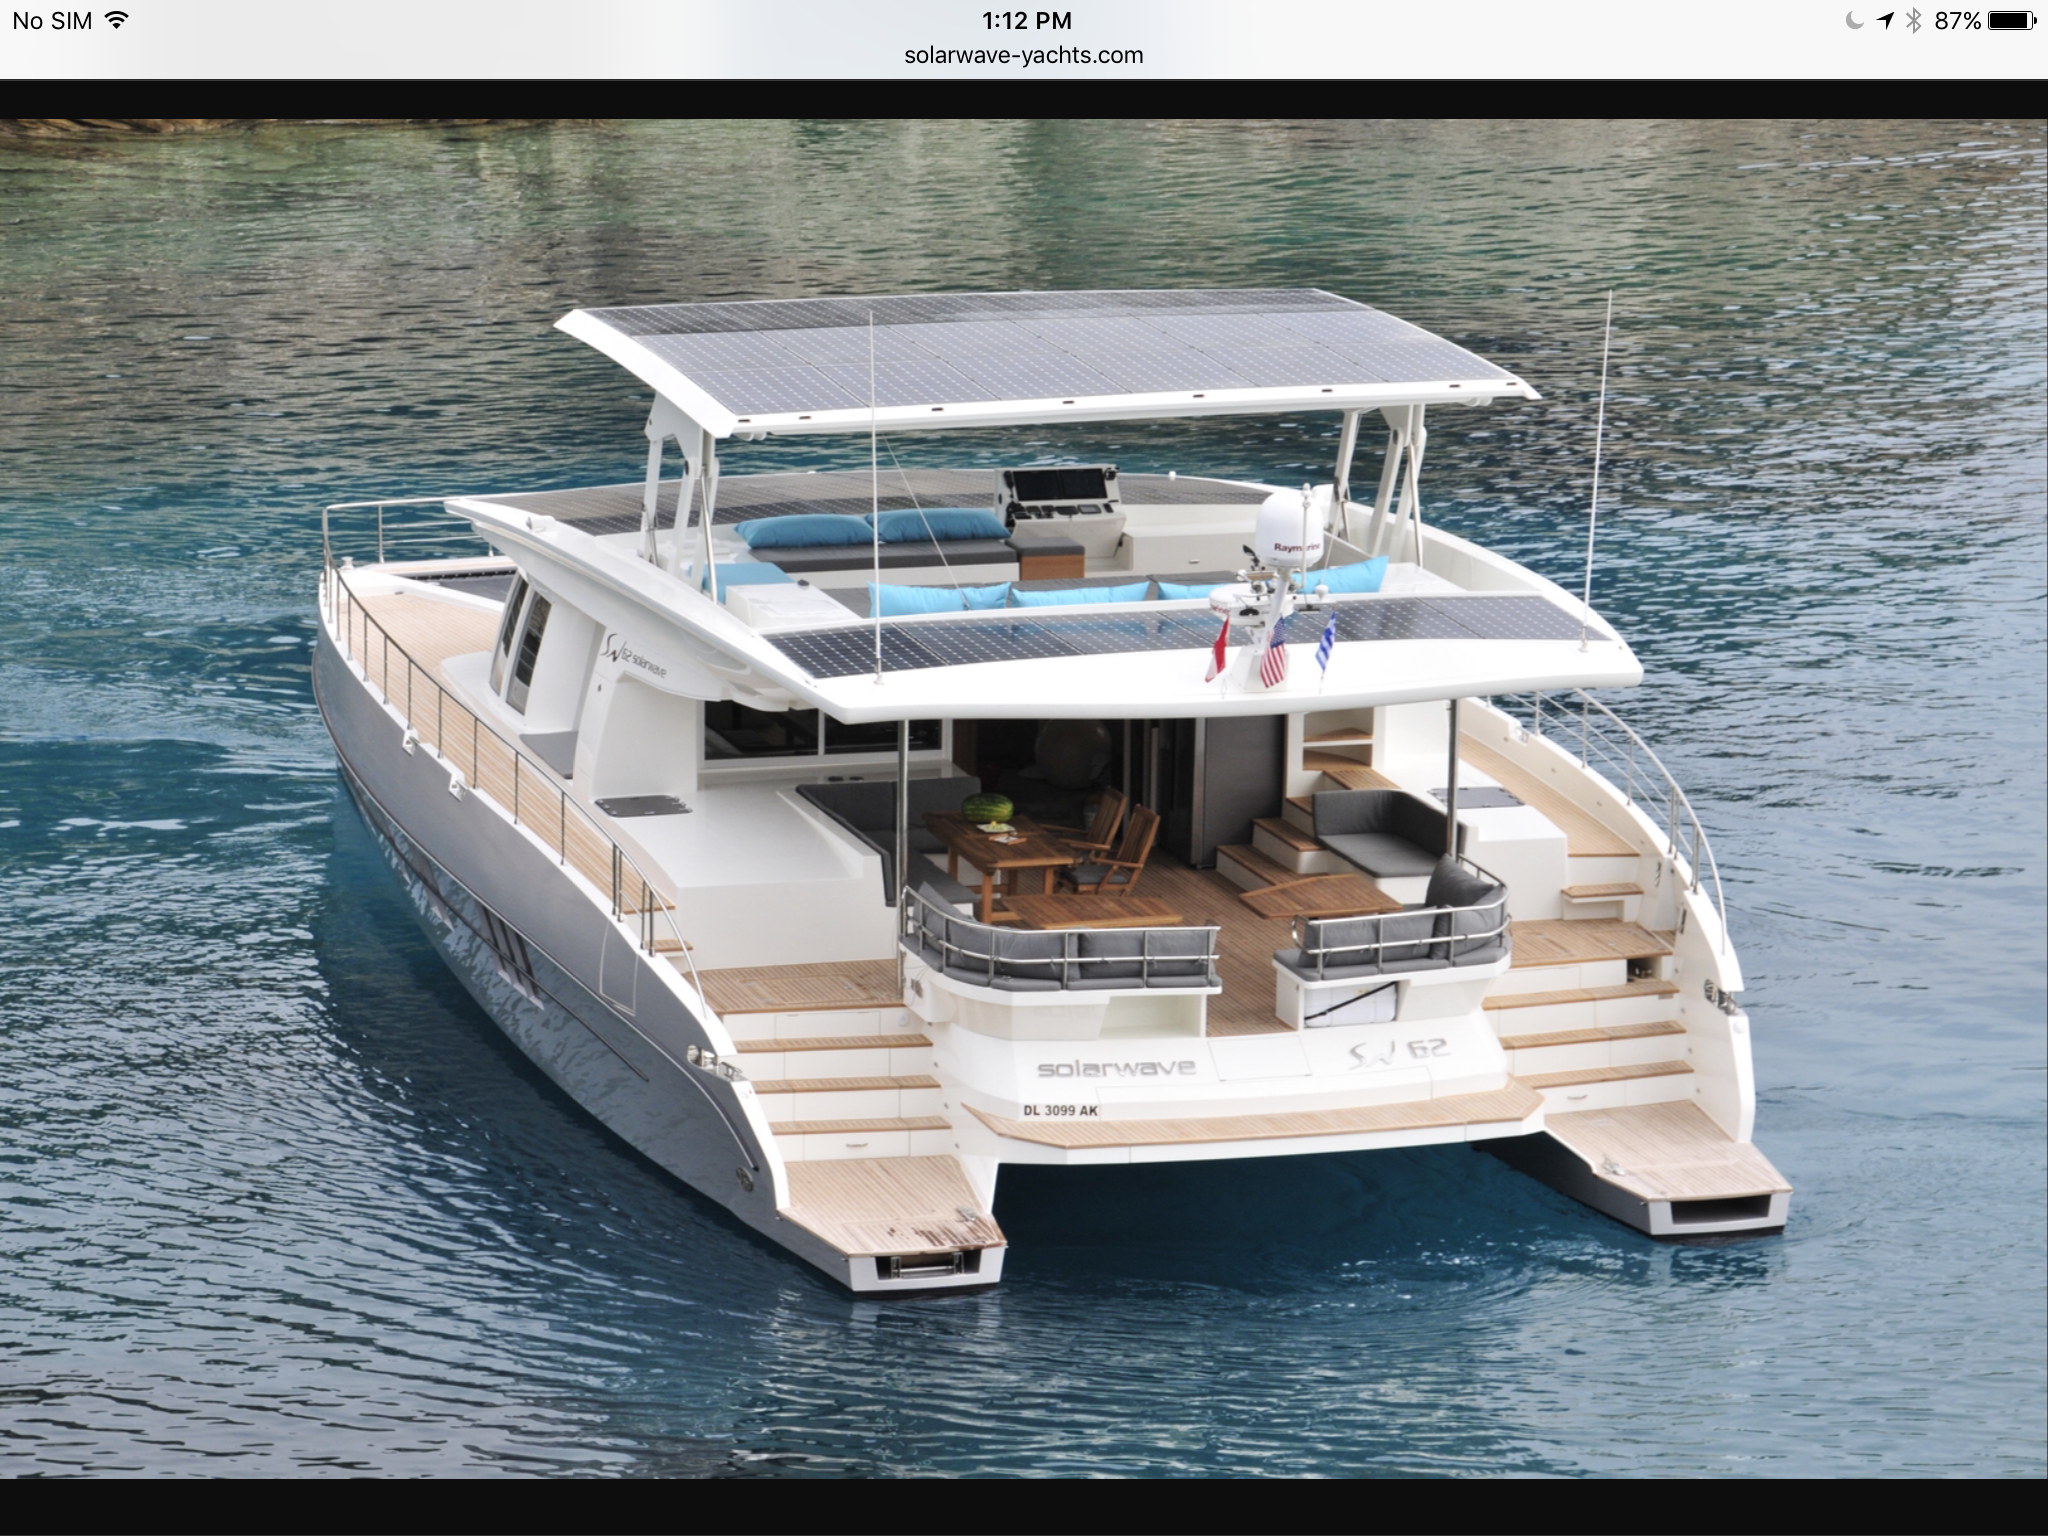 Power catamaran designs - Cabin Cruiser Power Catamaran Yachts Classic Searching Boating